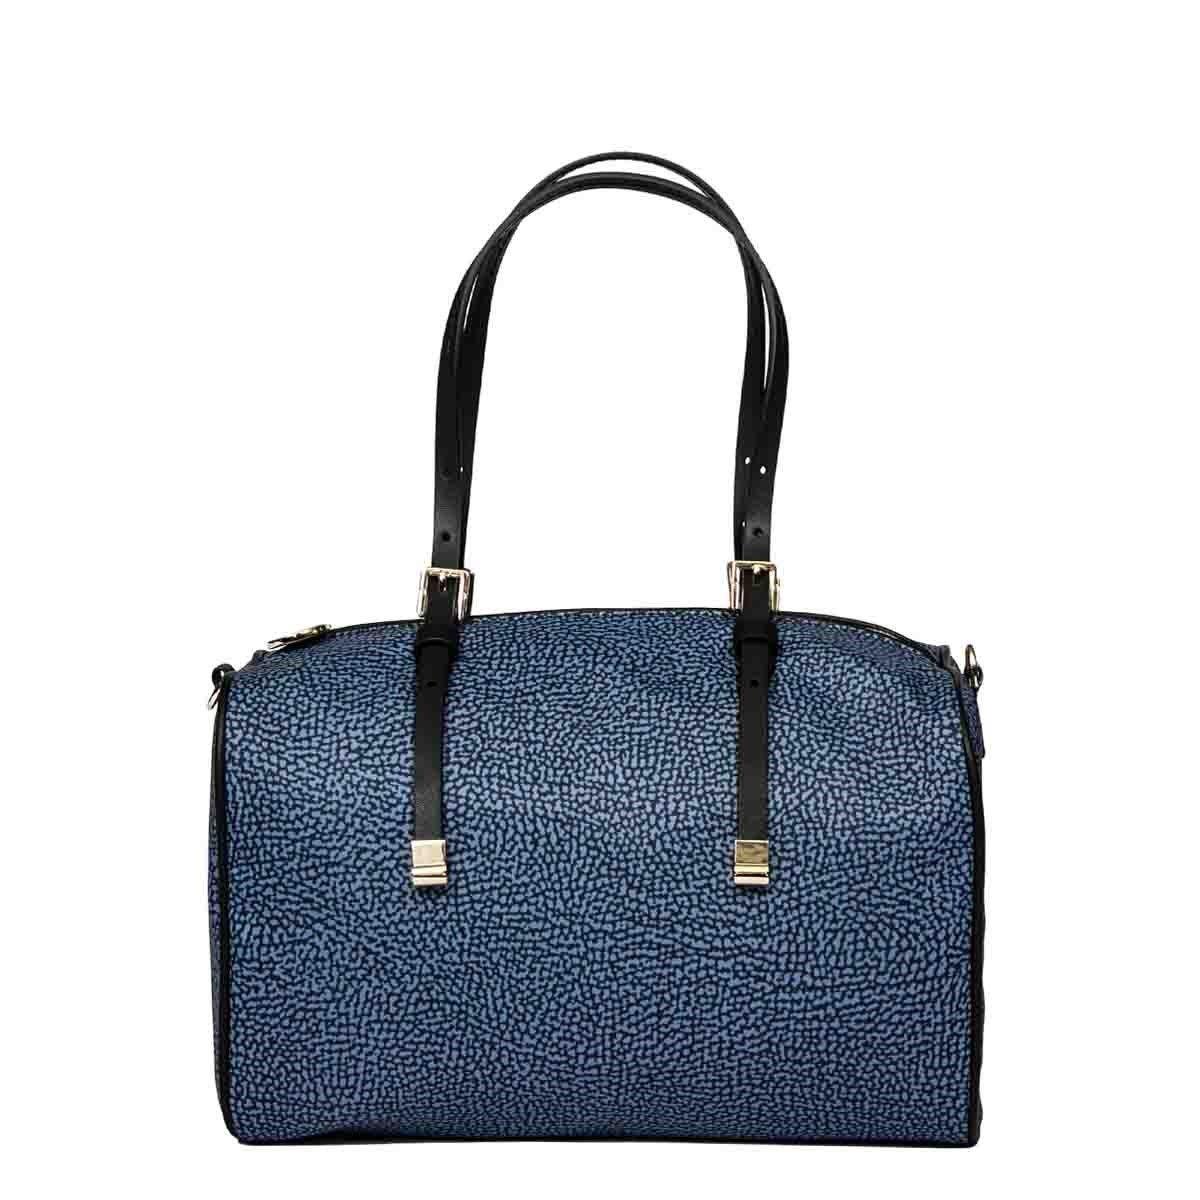 Borbonese Handbags BORBONESE WOMEN'S BLUE POLYESTER HANDBAG